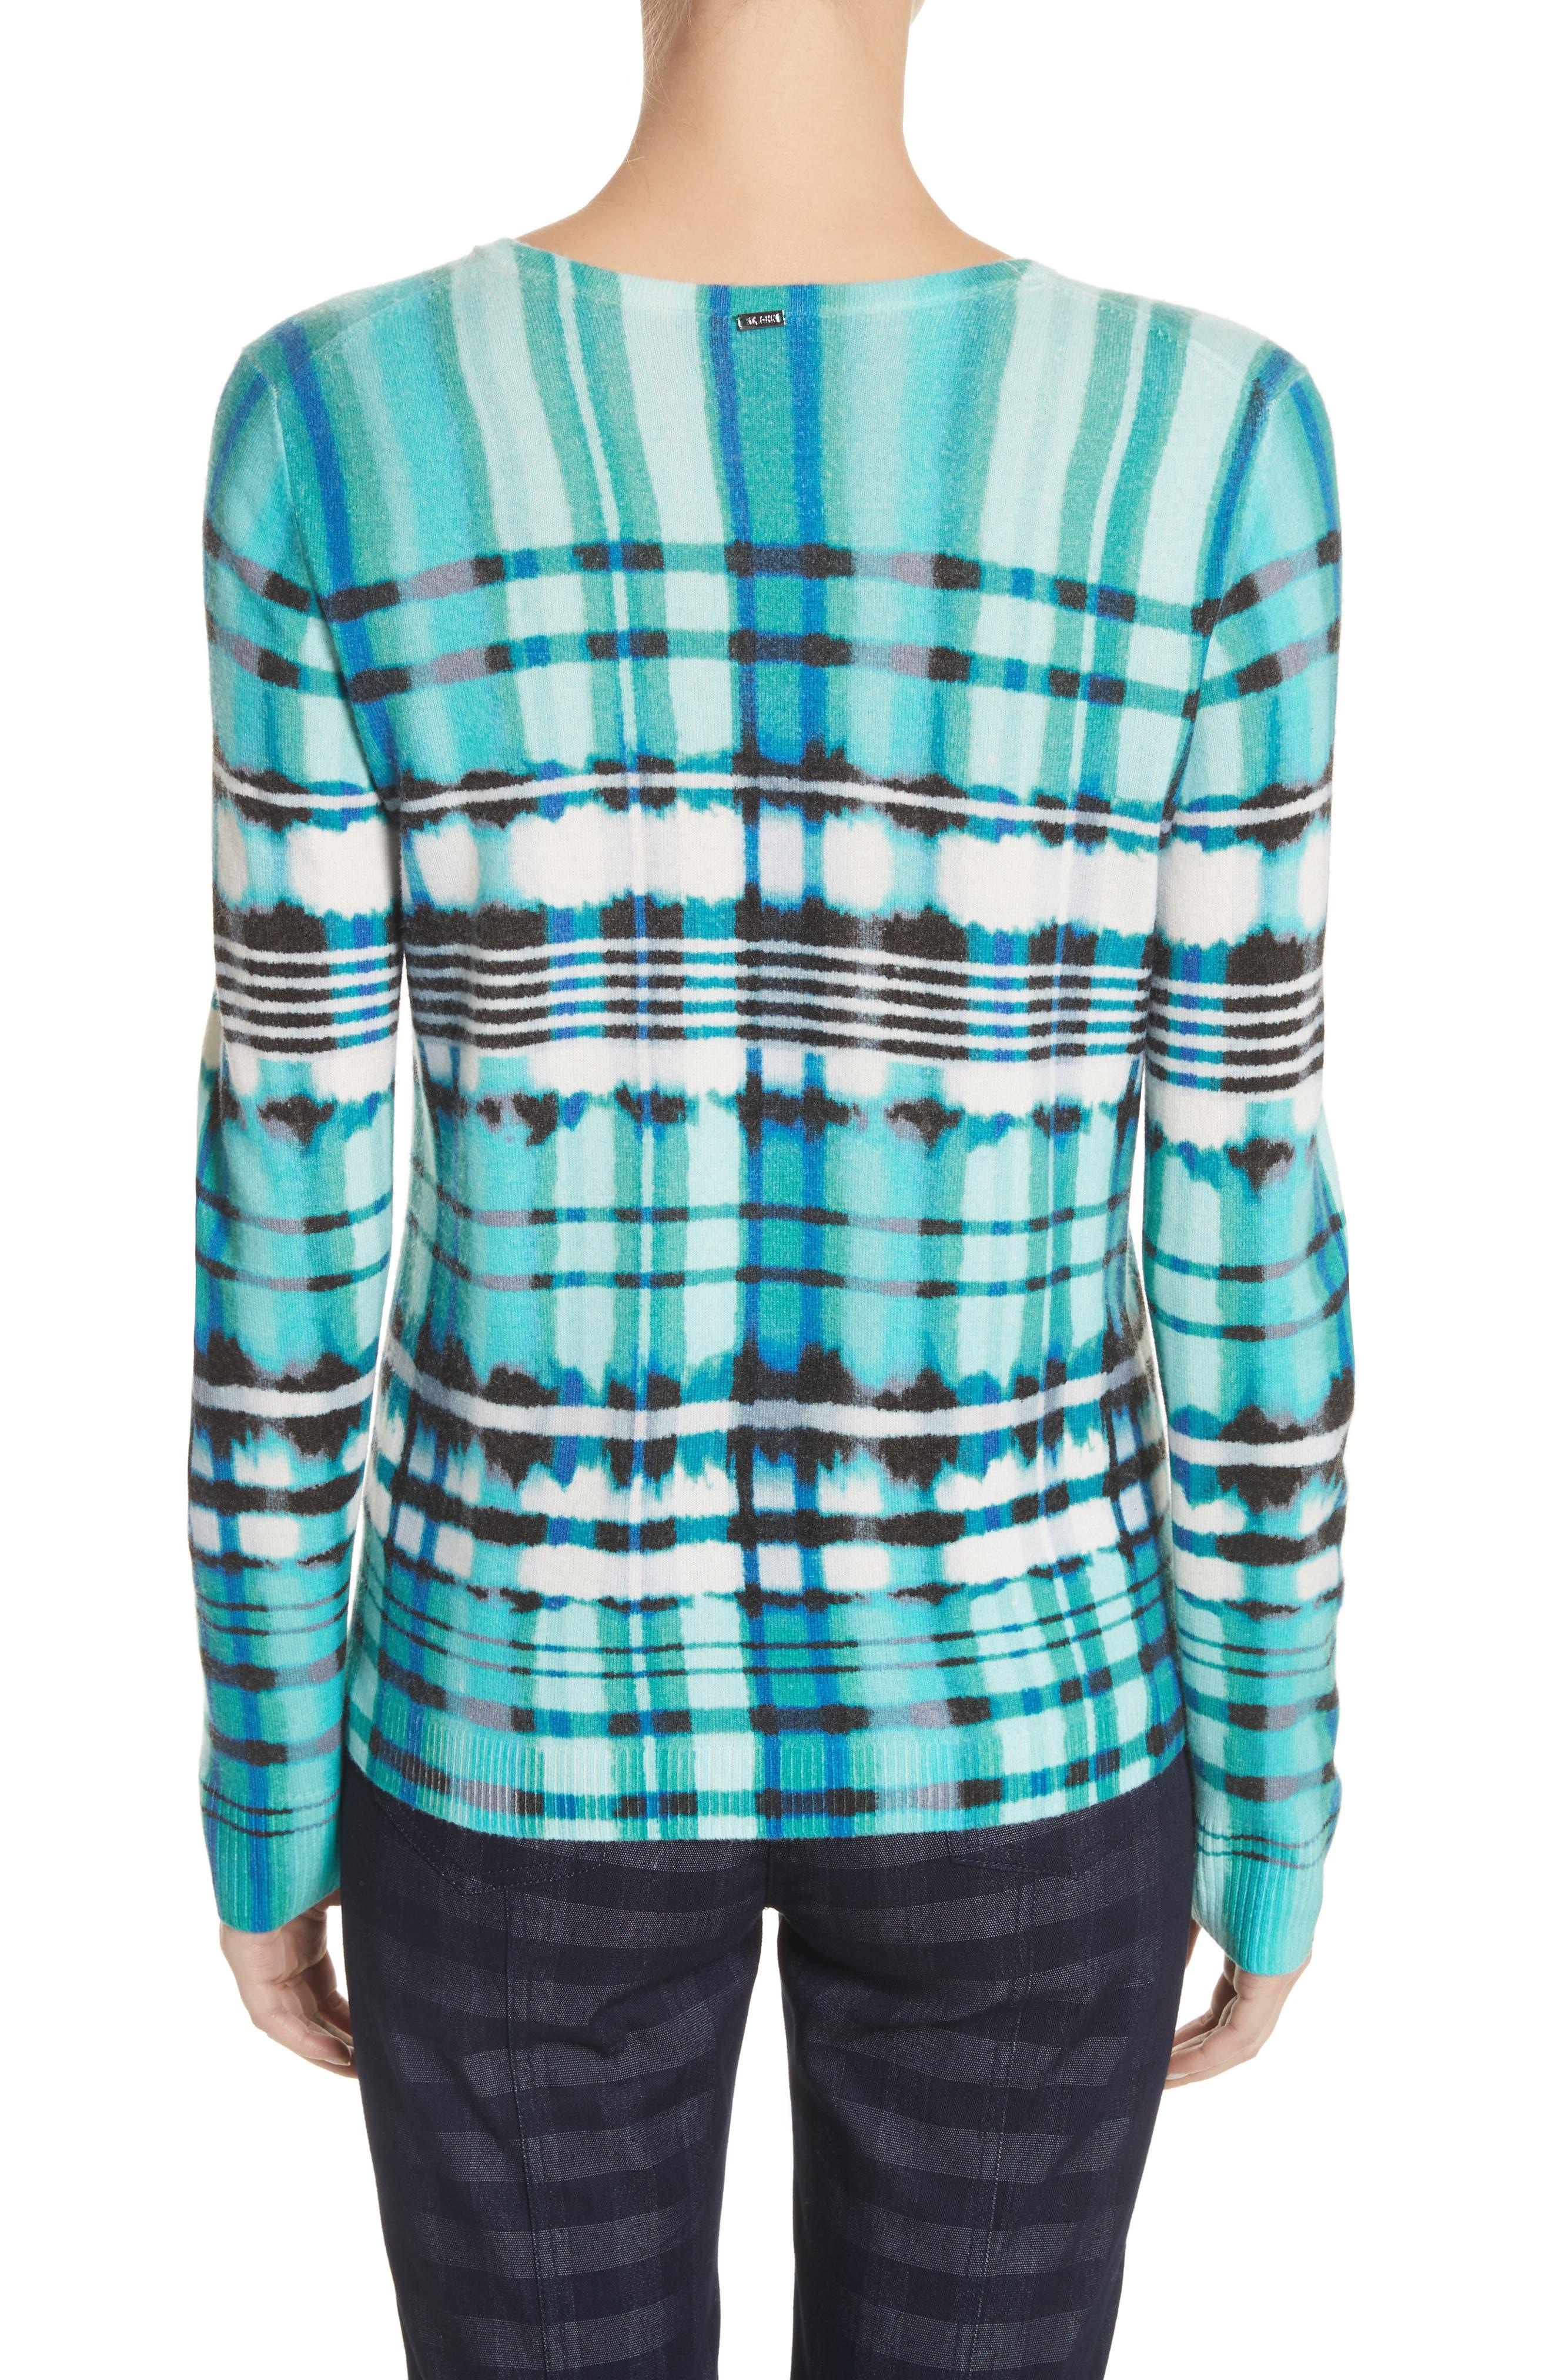 Overprint Plaid Cashmere Sweater,                             Alternate thumbnail 2, color,                             350